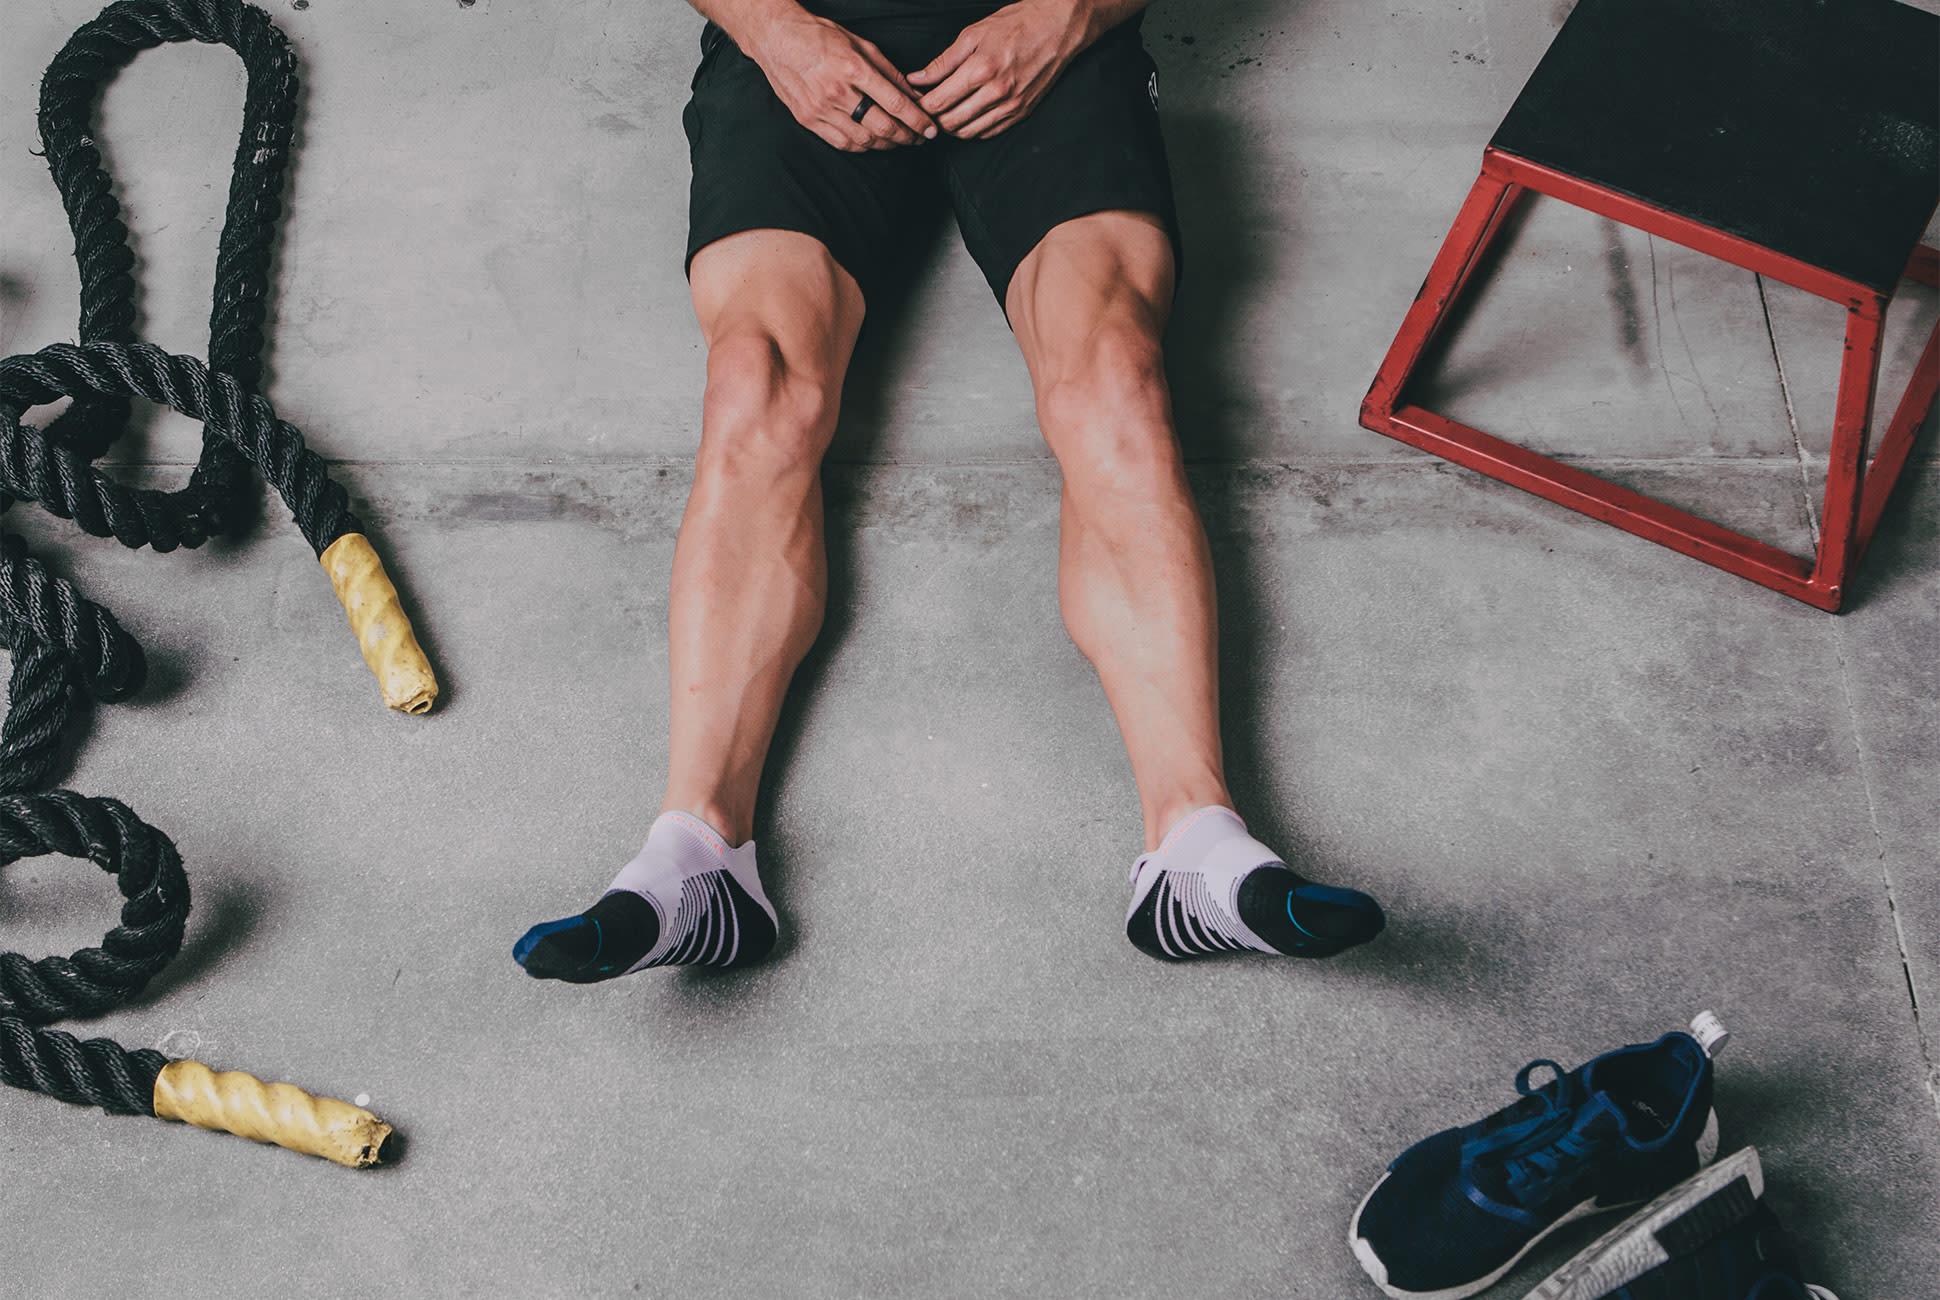 man wearing an ankle socks on fitness training